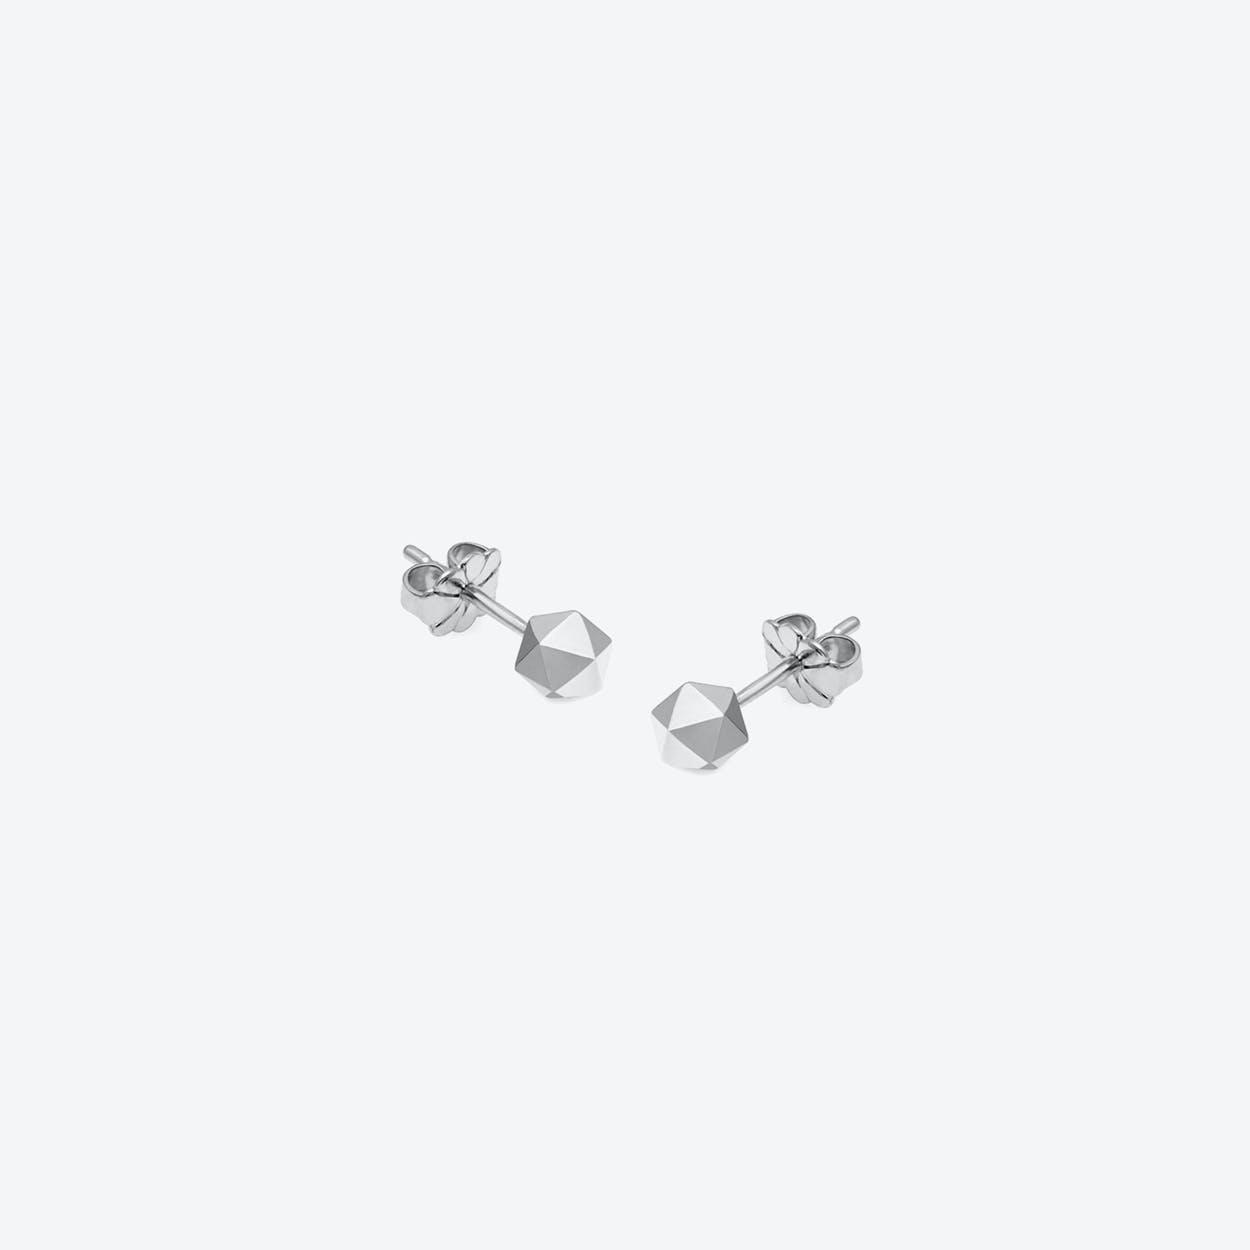 Icosahedron Stud Earrings in Silver